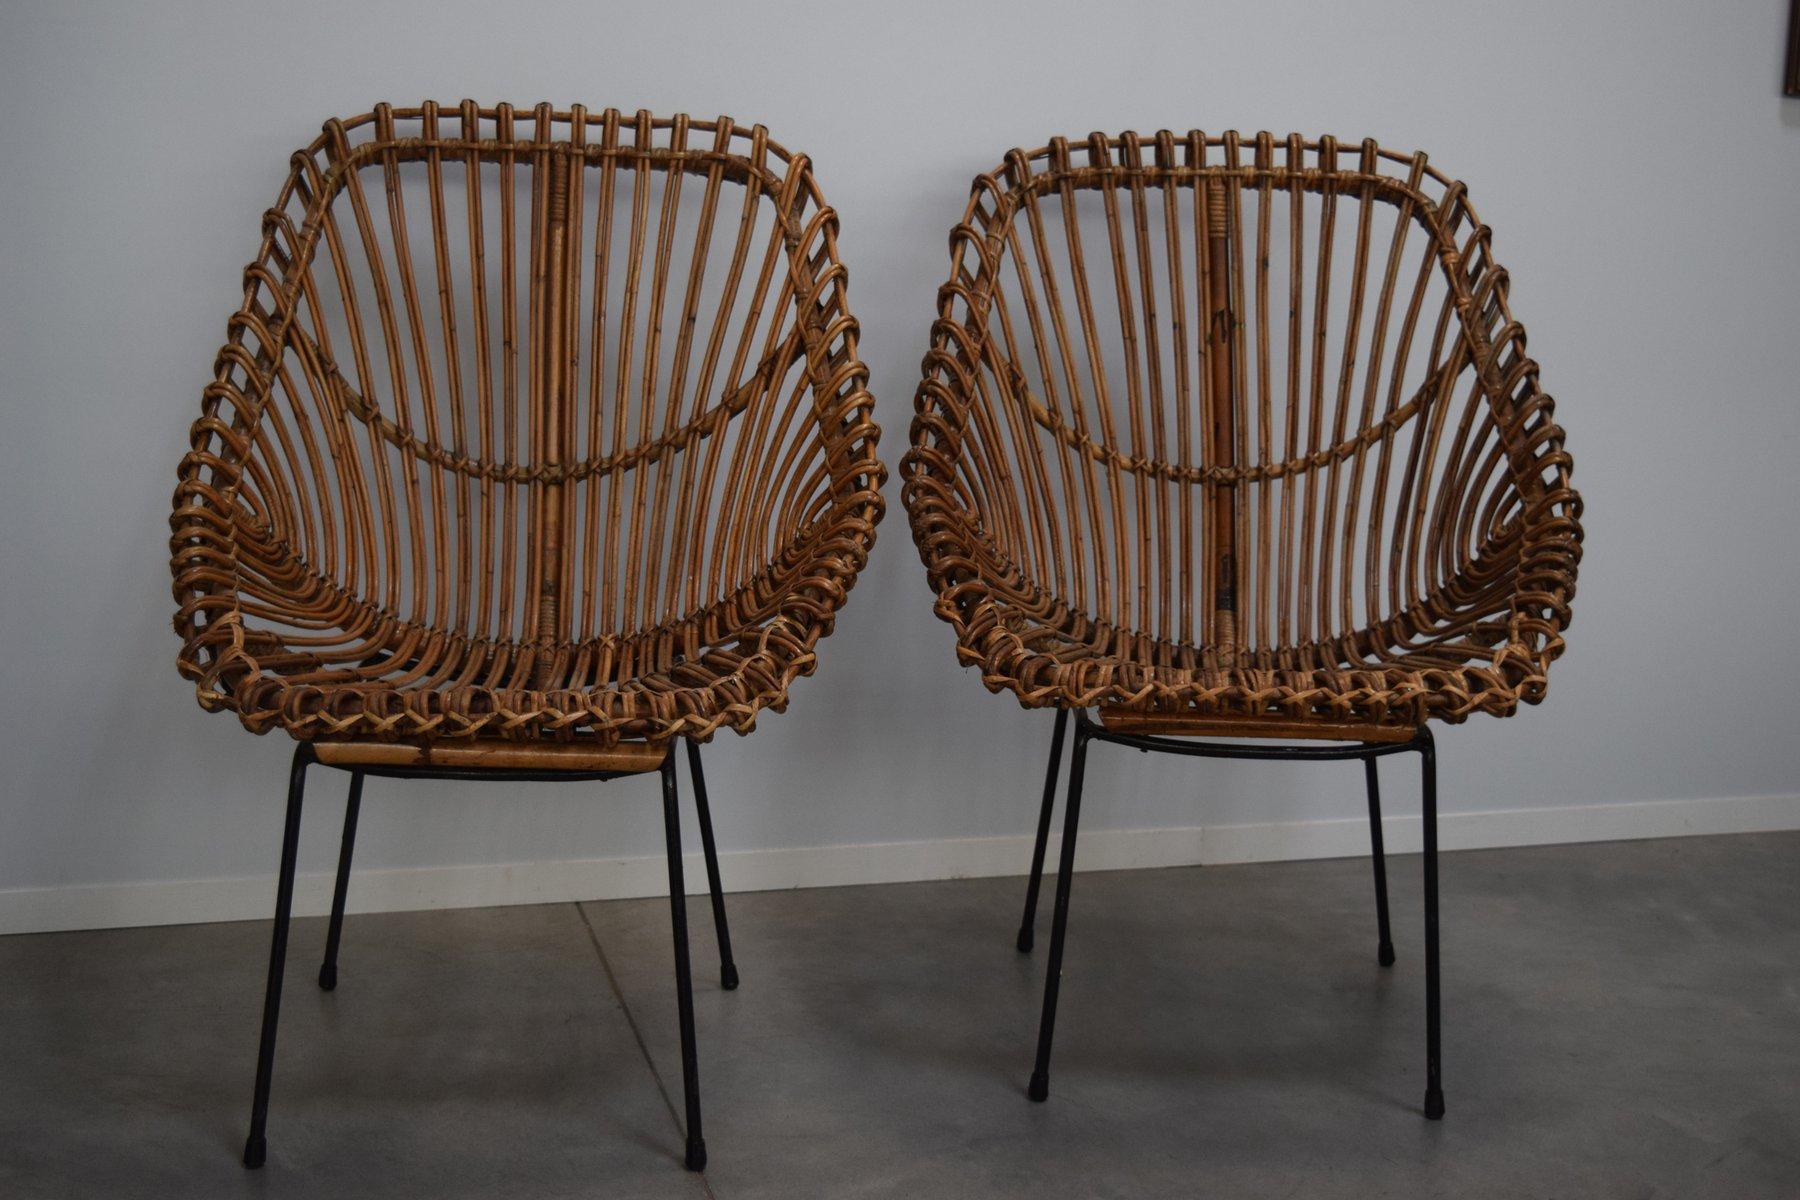 chairs imports pier rattan shop chair brown wicker temani